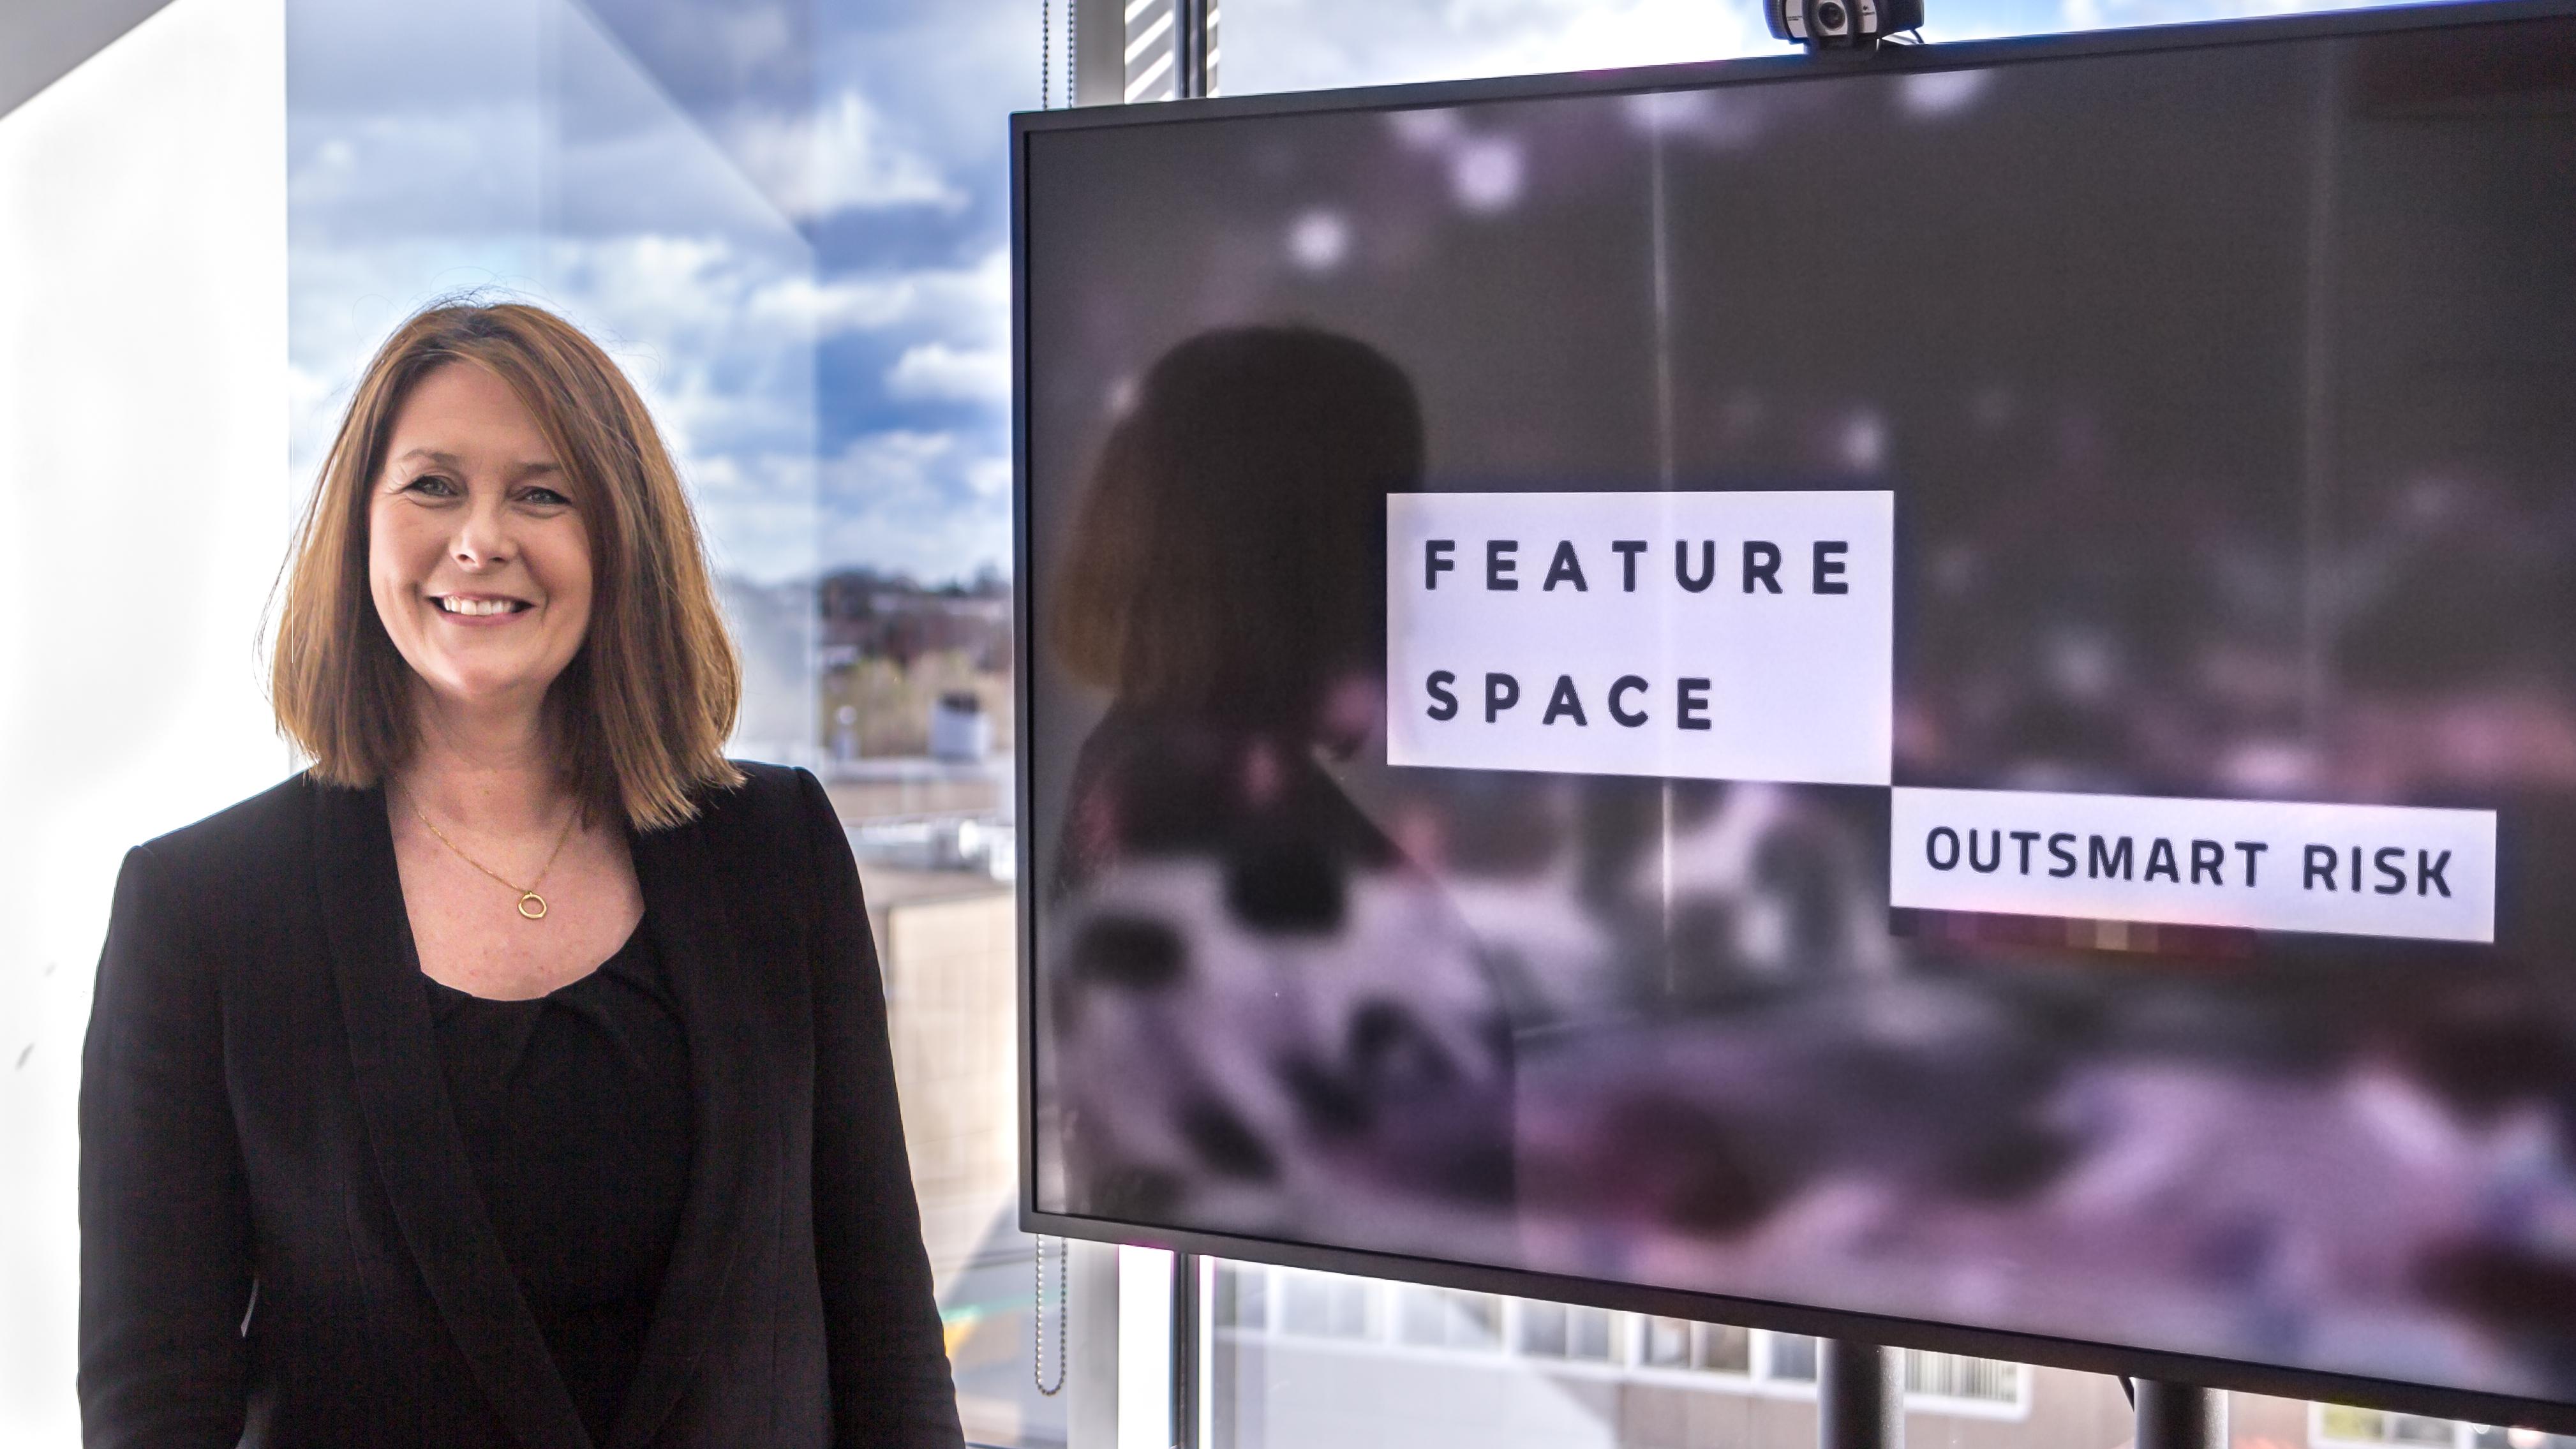 Featurespace raises £30 million to drive growth